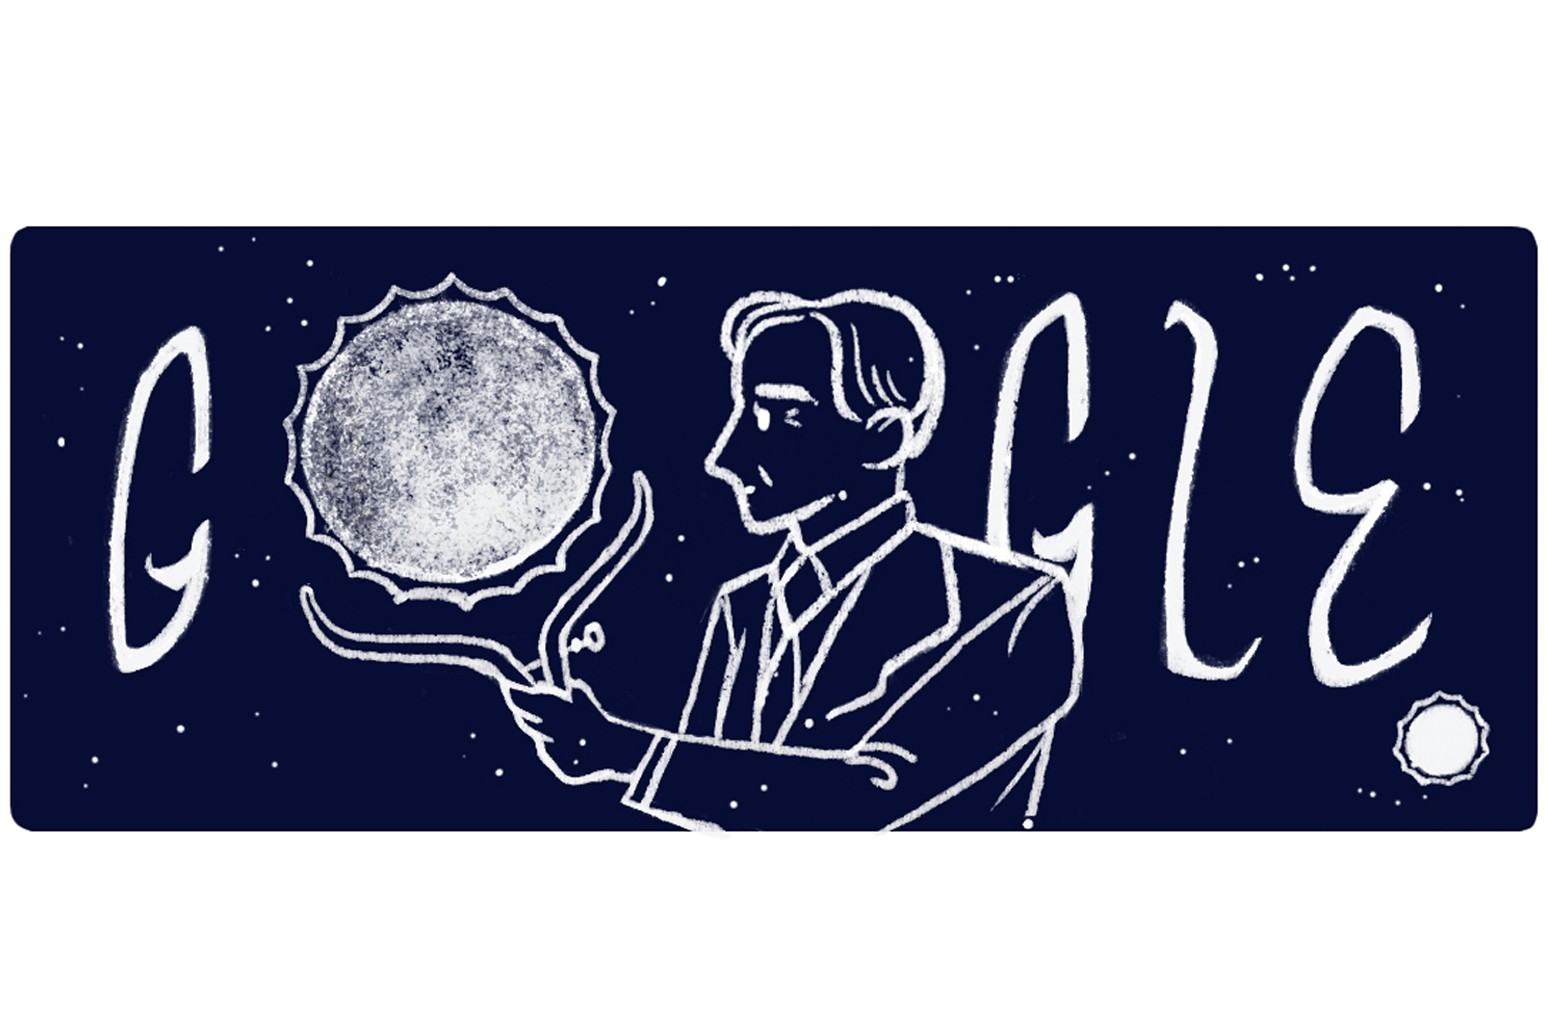 Google Doodle 2017